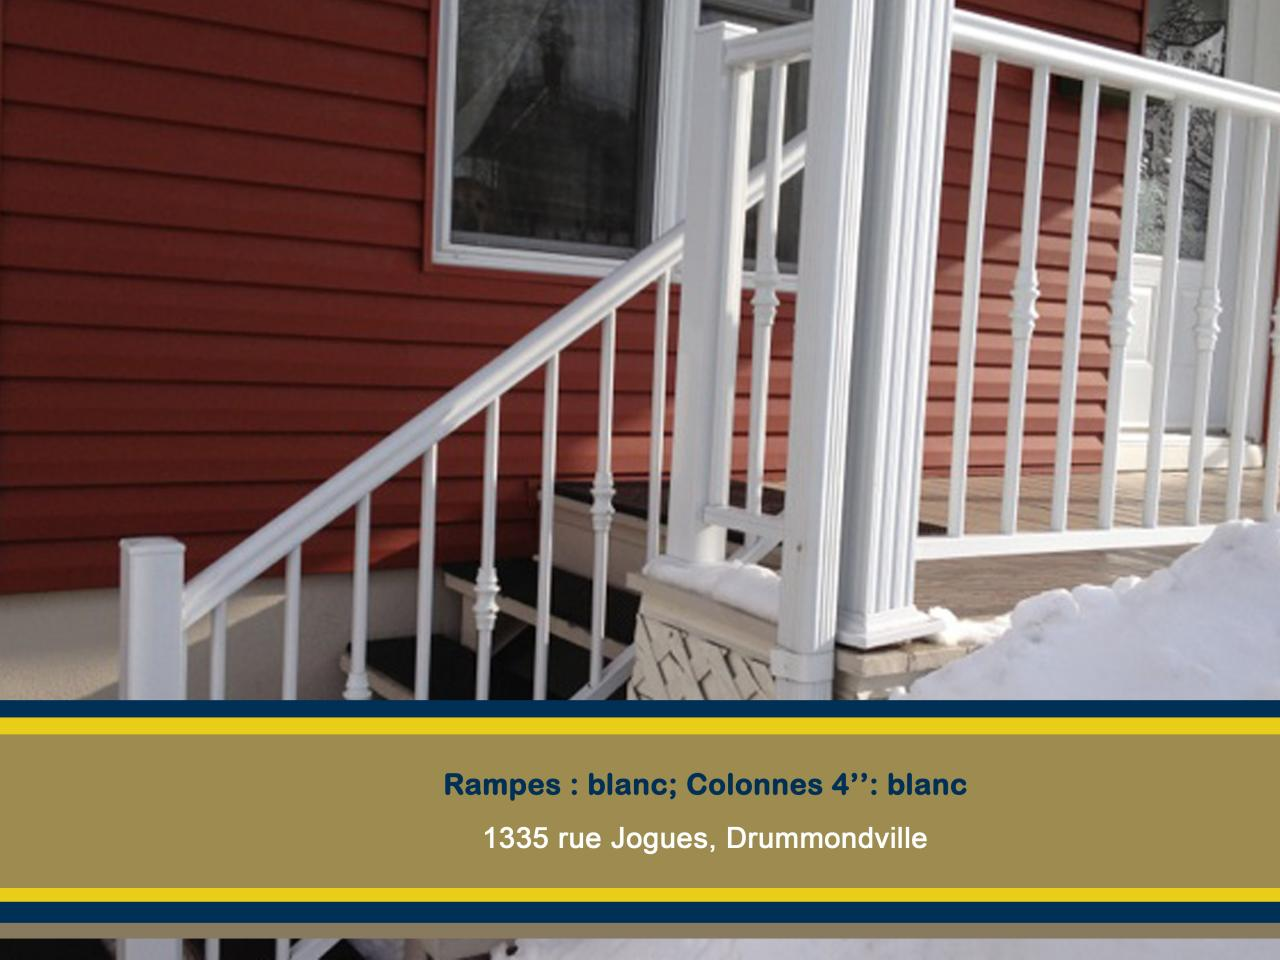 ramoes 1335 rue Jogues Drummondville